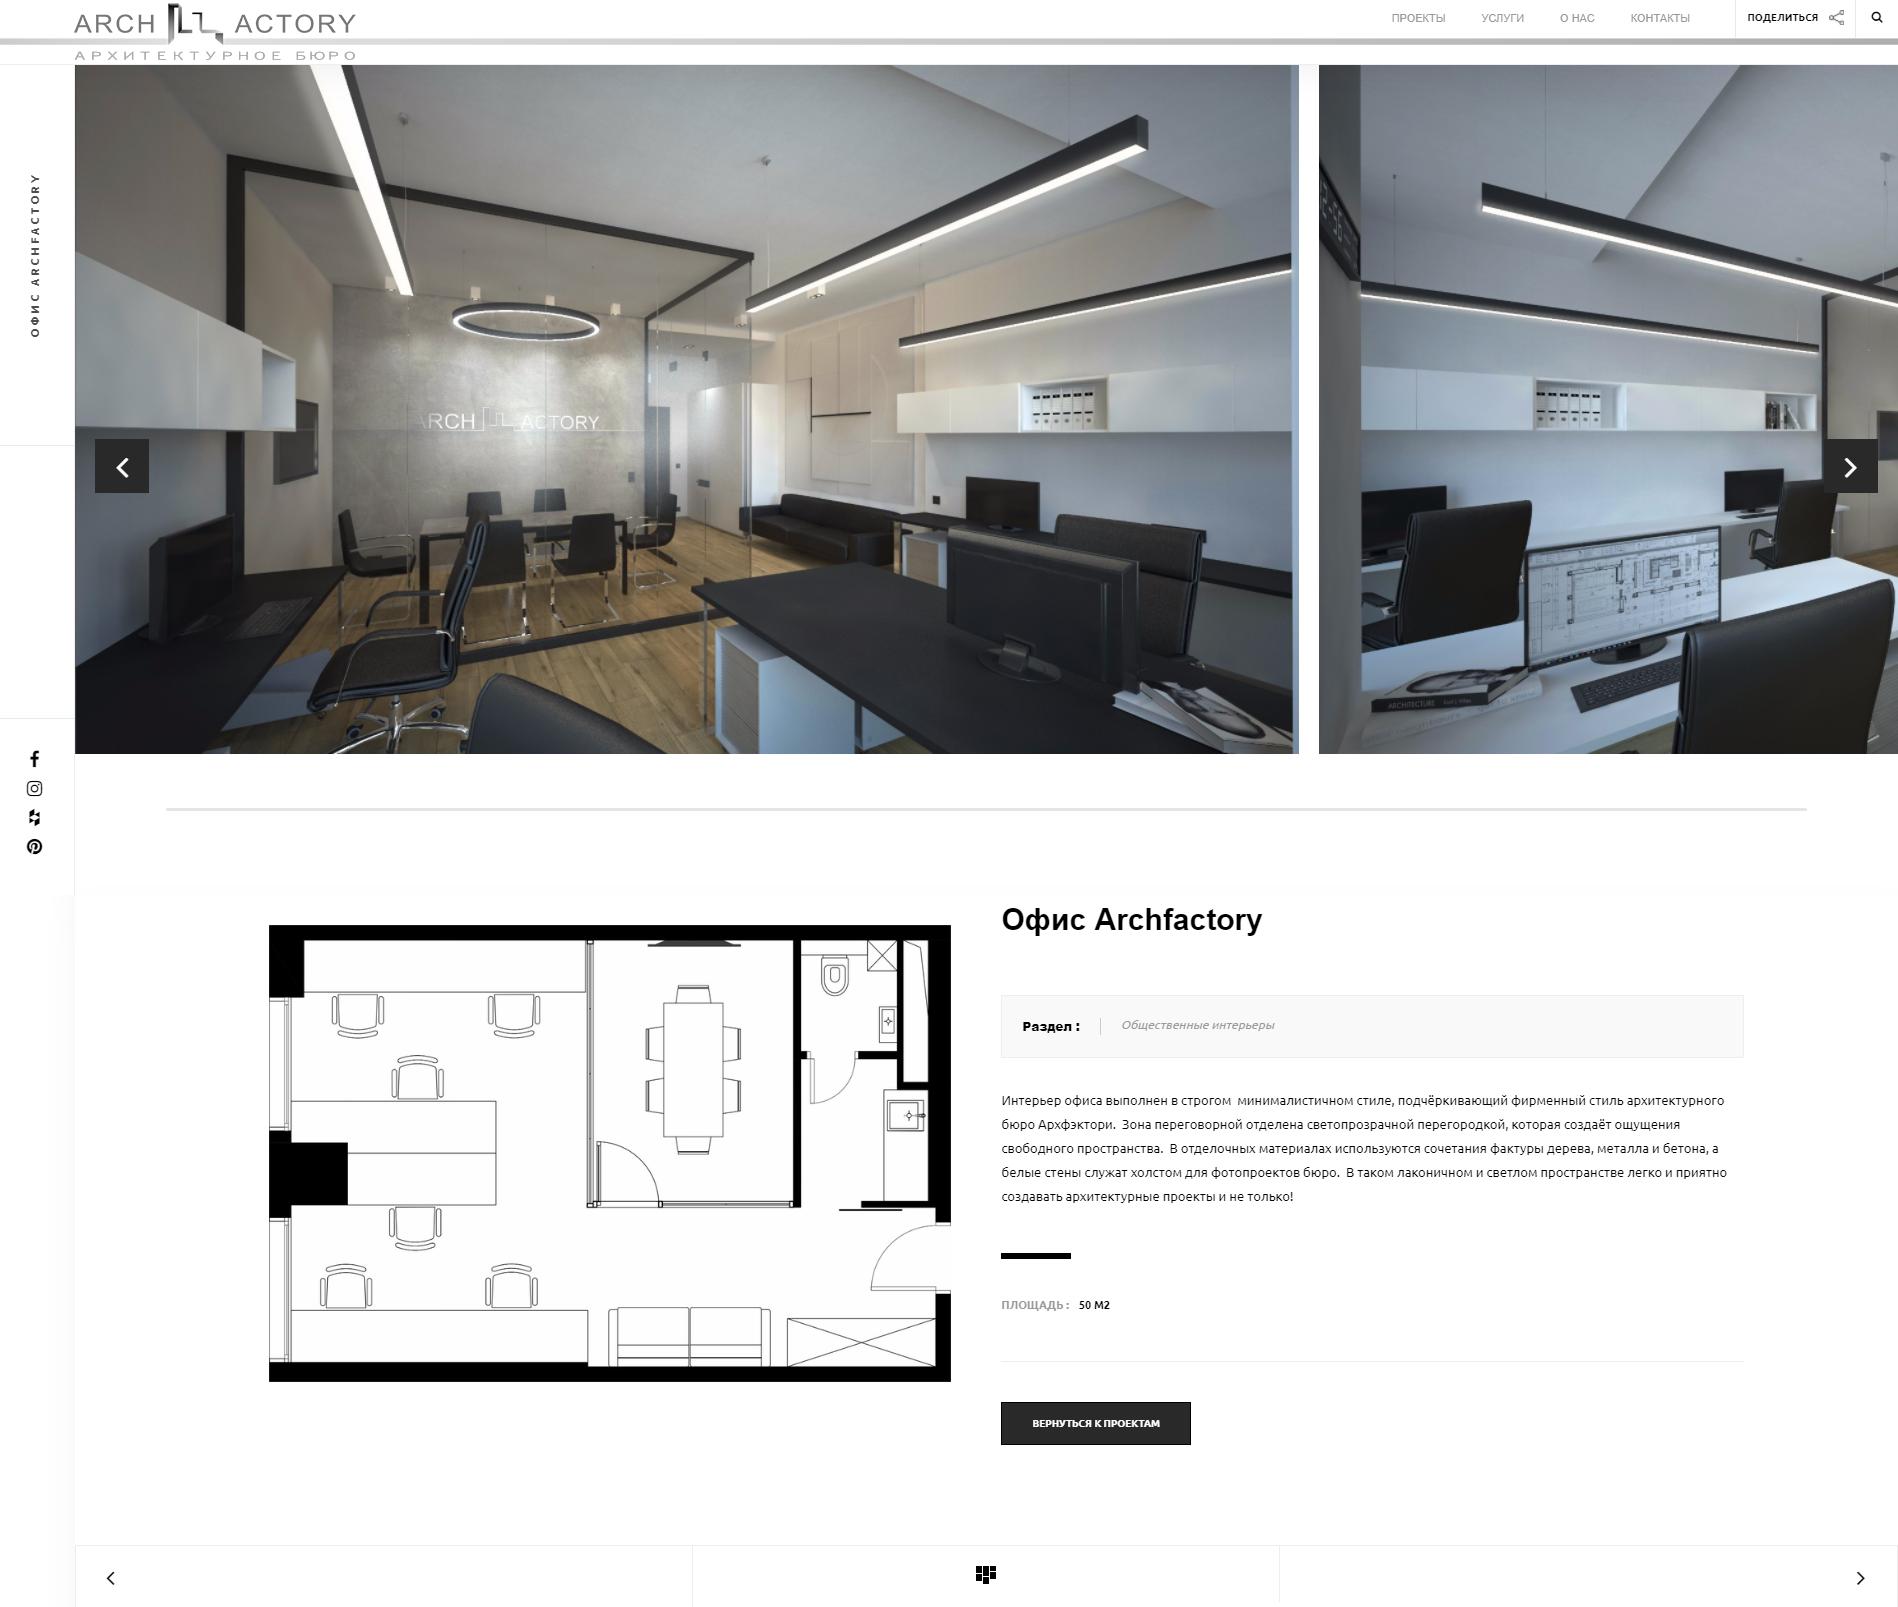 Корпоративный сайт для архитектурного бюро Archfectory